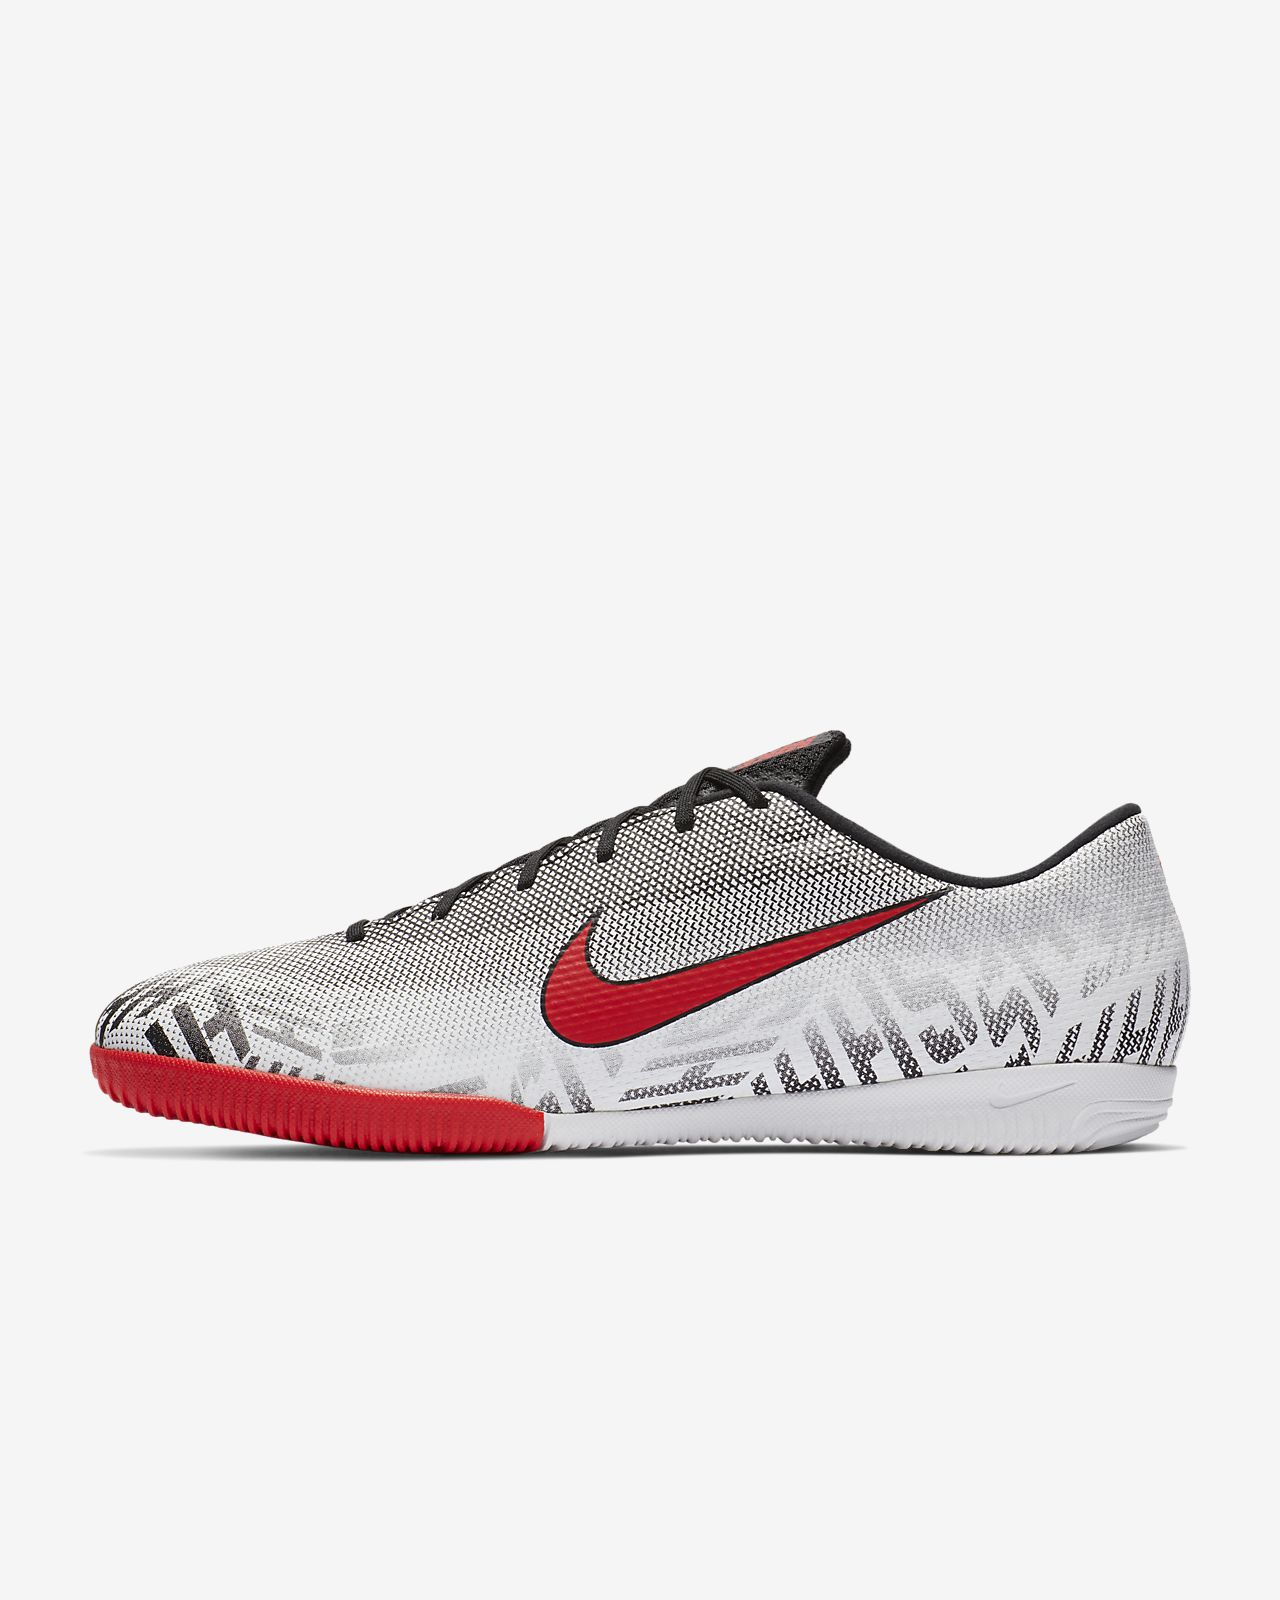 31e71796d48 Nike Mercurial Vapor XII Academy Neymar Jr Indoor Court Soccer Shoe ...